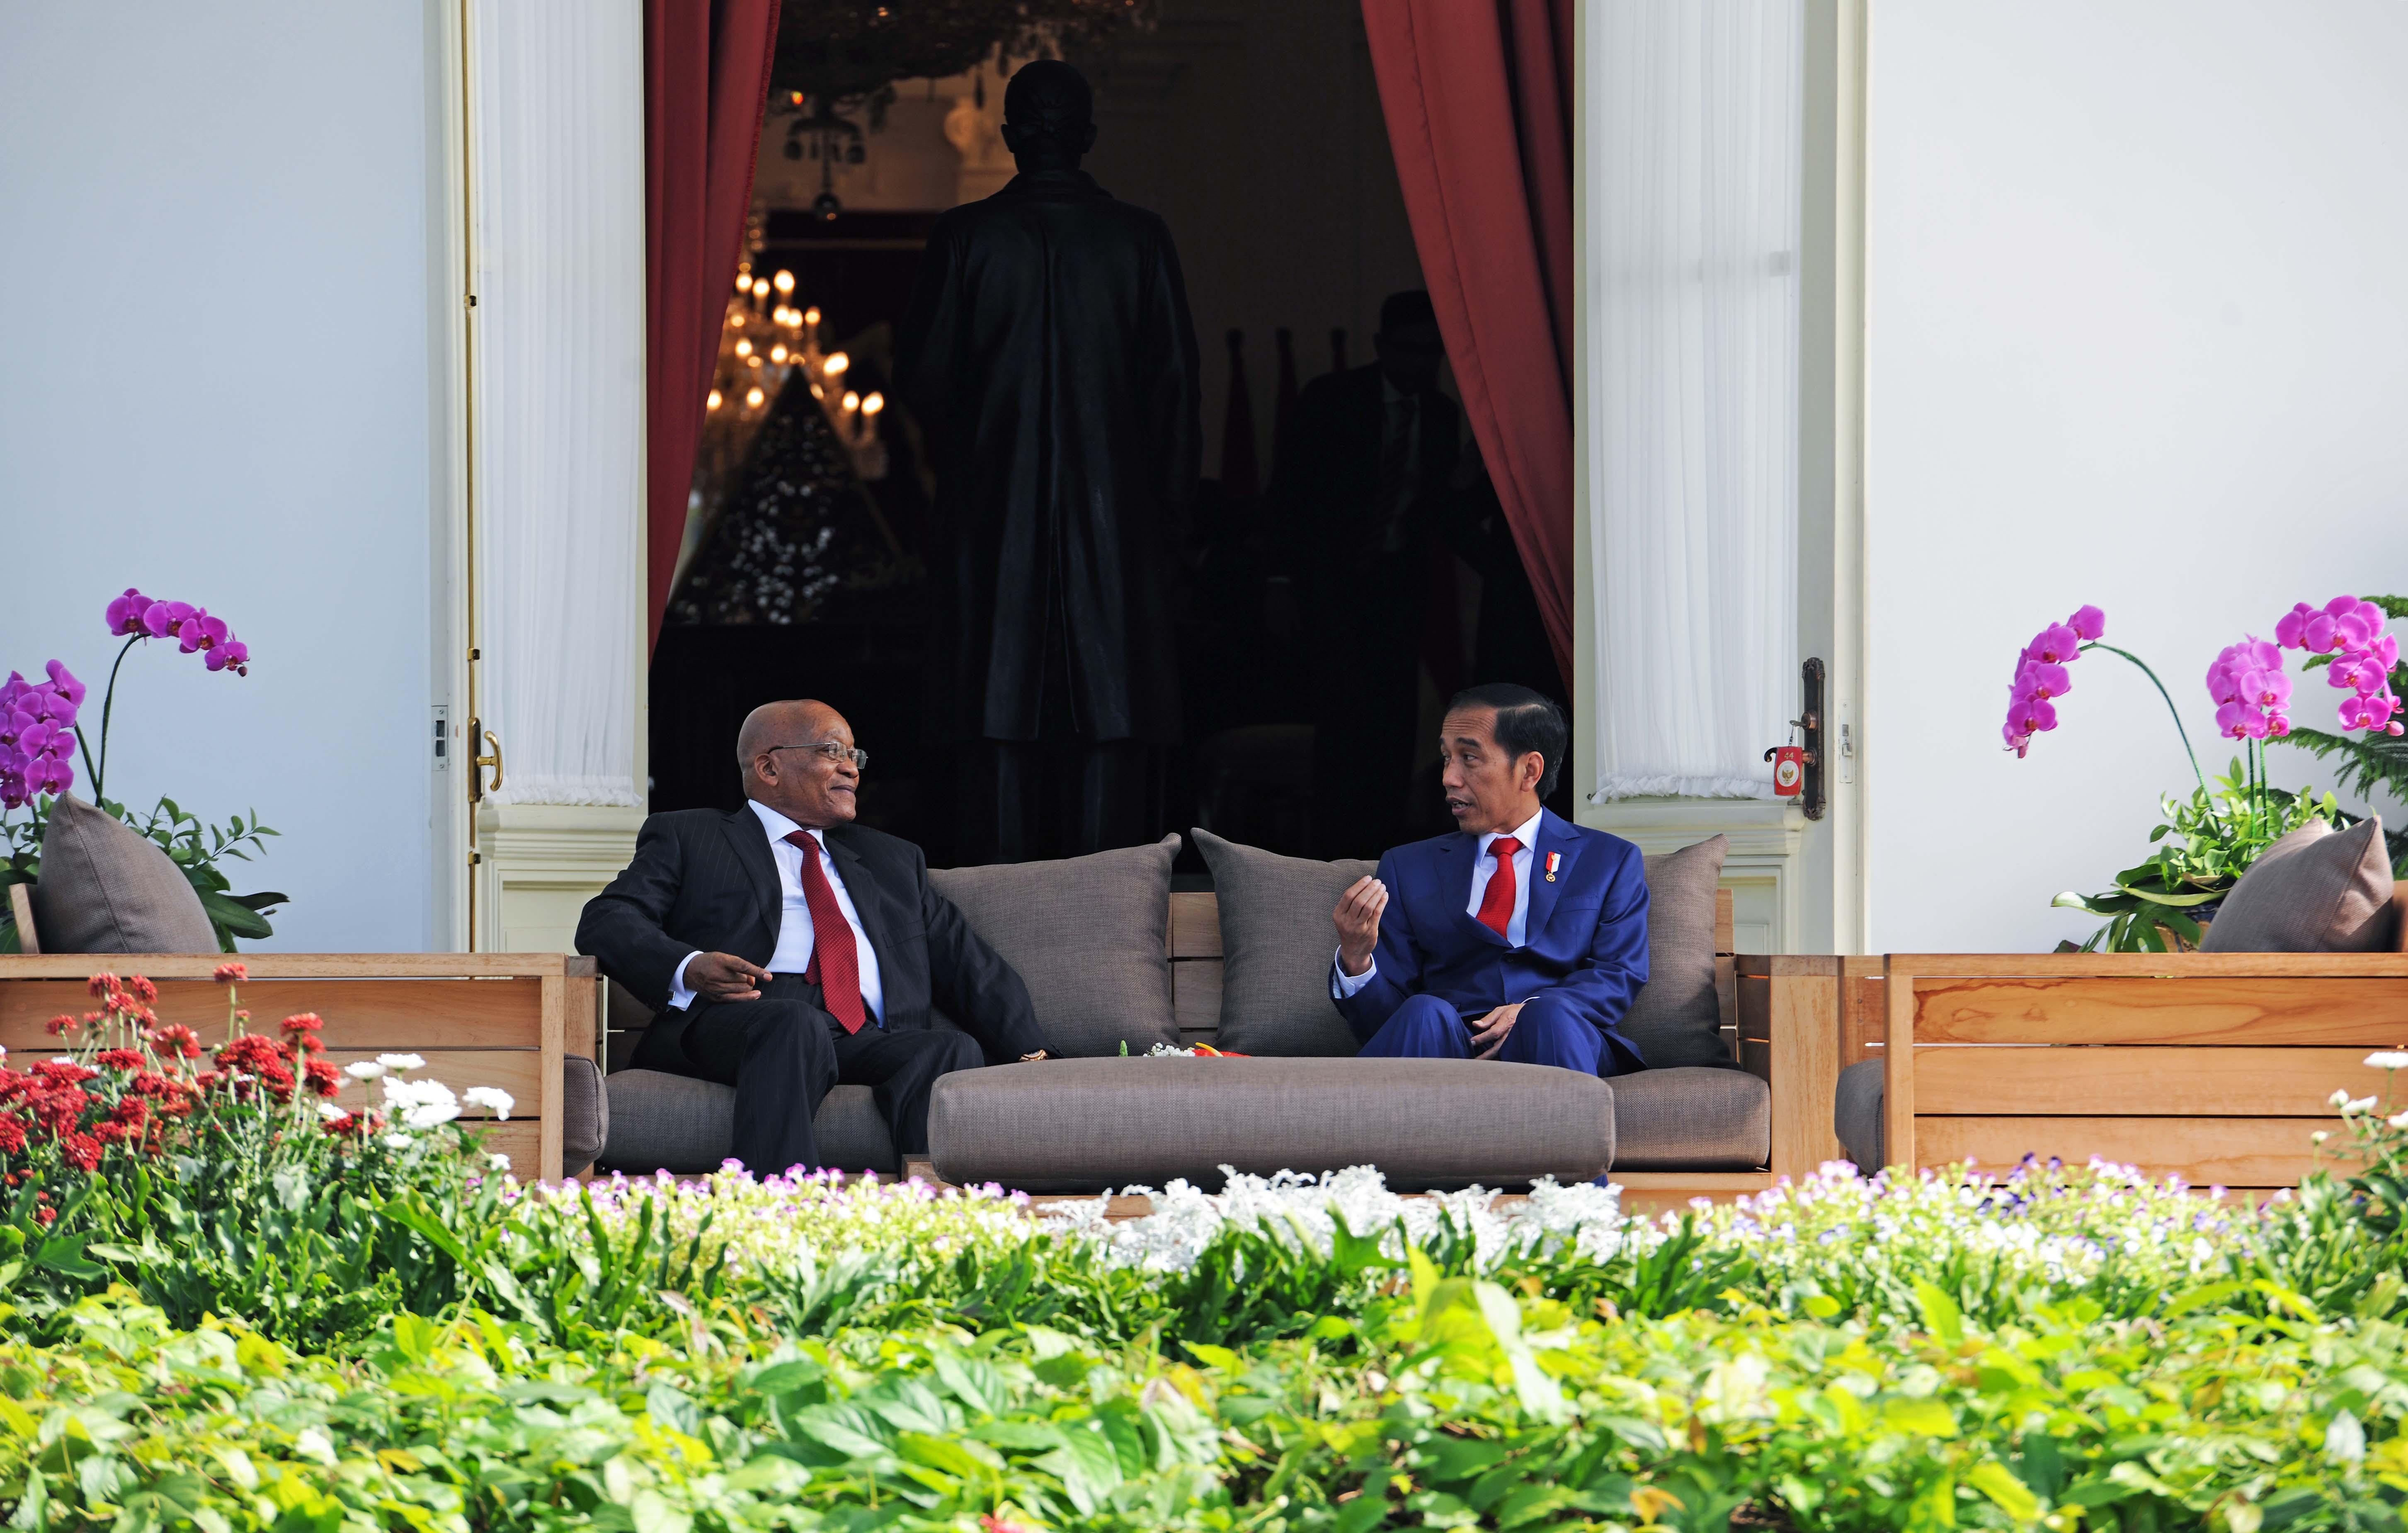 Presiden Jokowi saat melakukan Veranda Talk bersama Presiden Afrika Selatan, Jacob Zuma di Istana Merdeka, Jakarta. Rabu (8/3). (Foto: Humas/Jay)